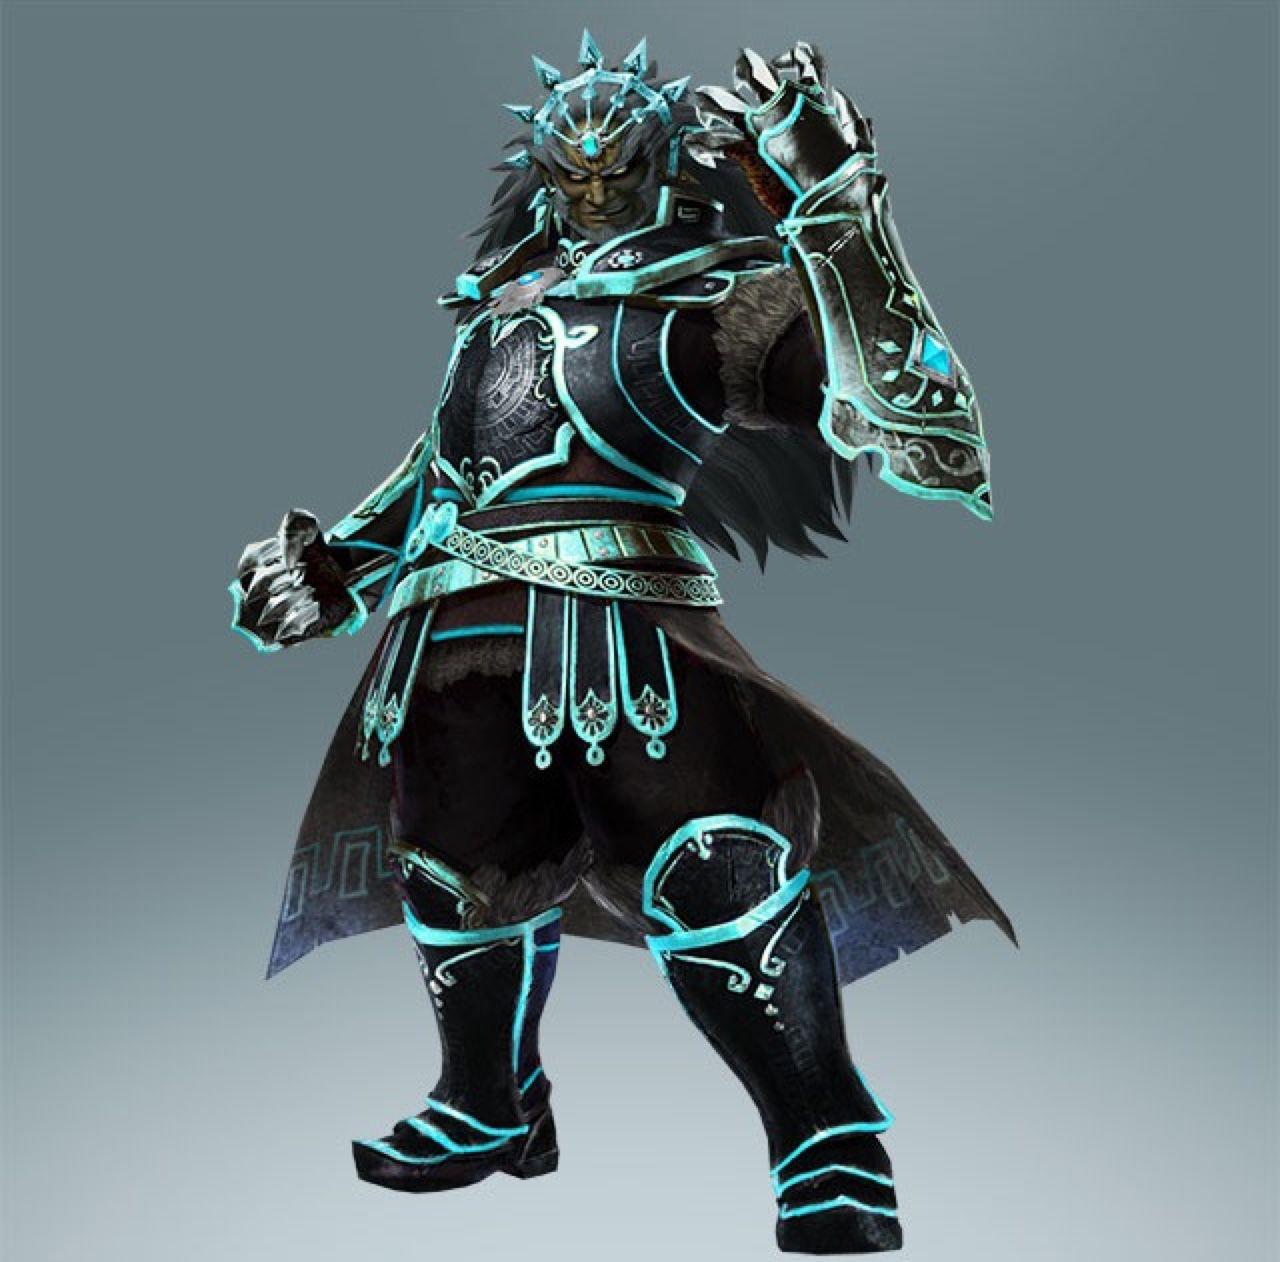 Ganondorf S New Costume For The Great Sea Map Hyrule Warriors Legend Of Zelda Legend